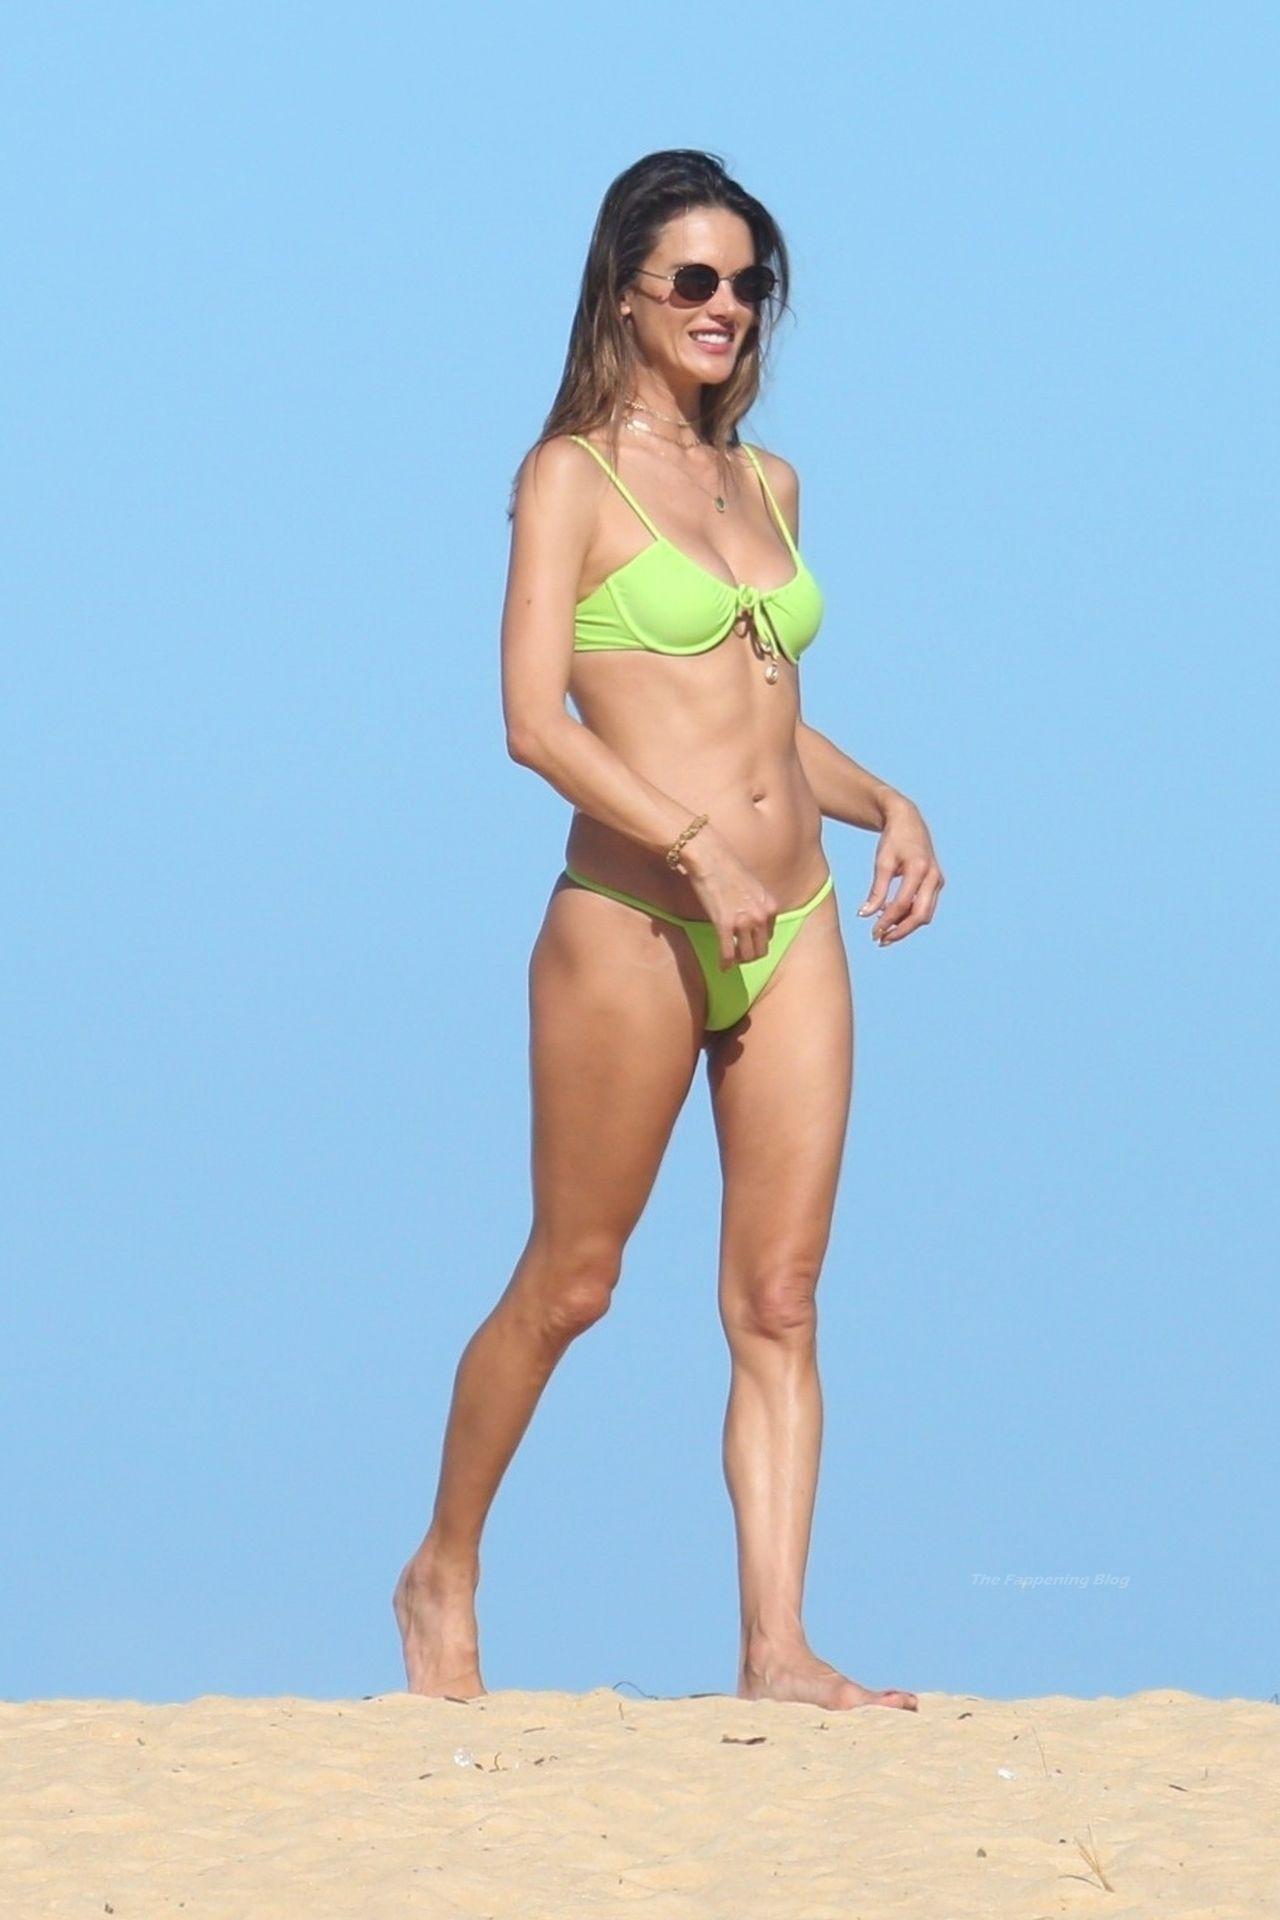 Alessandra-Ambrosio-Sexy-The-Fappening-Blog-111.jpg